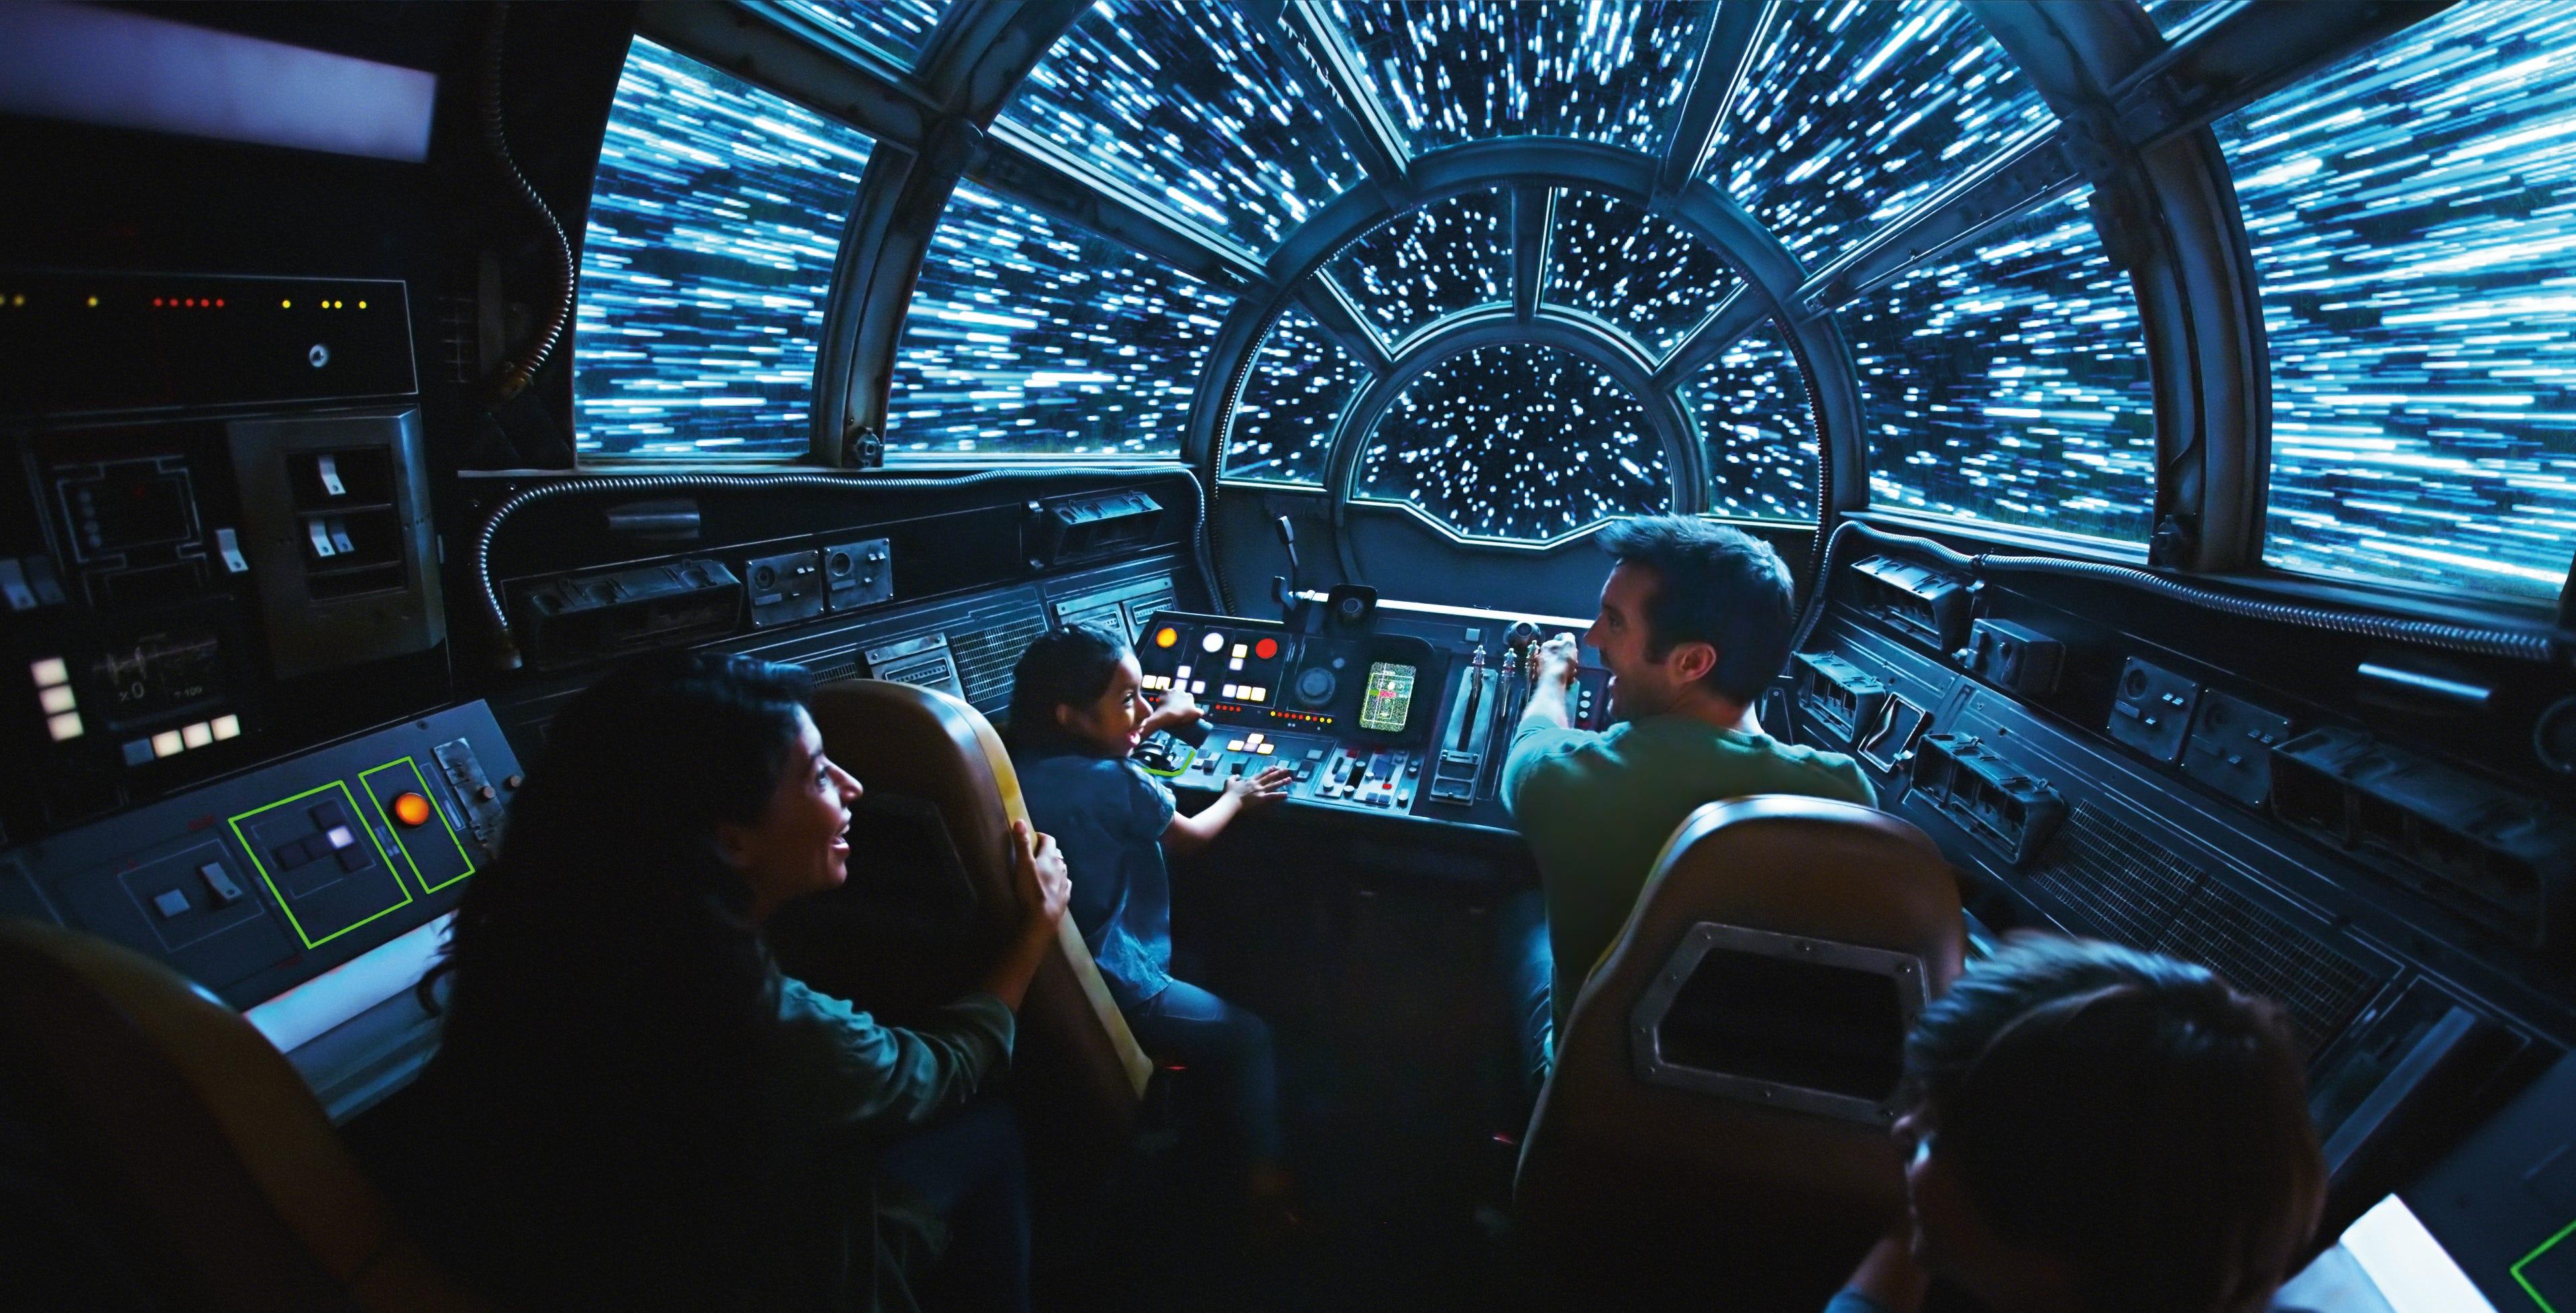 Star Wars: Galaxy's Edge at Disneyland: Get a sneak peek